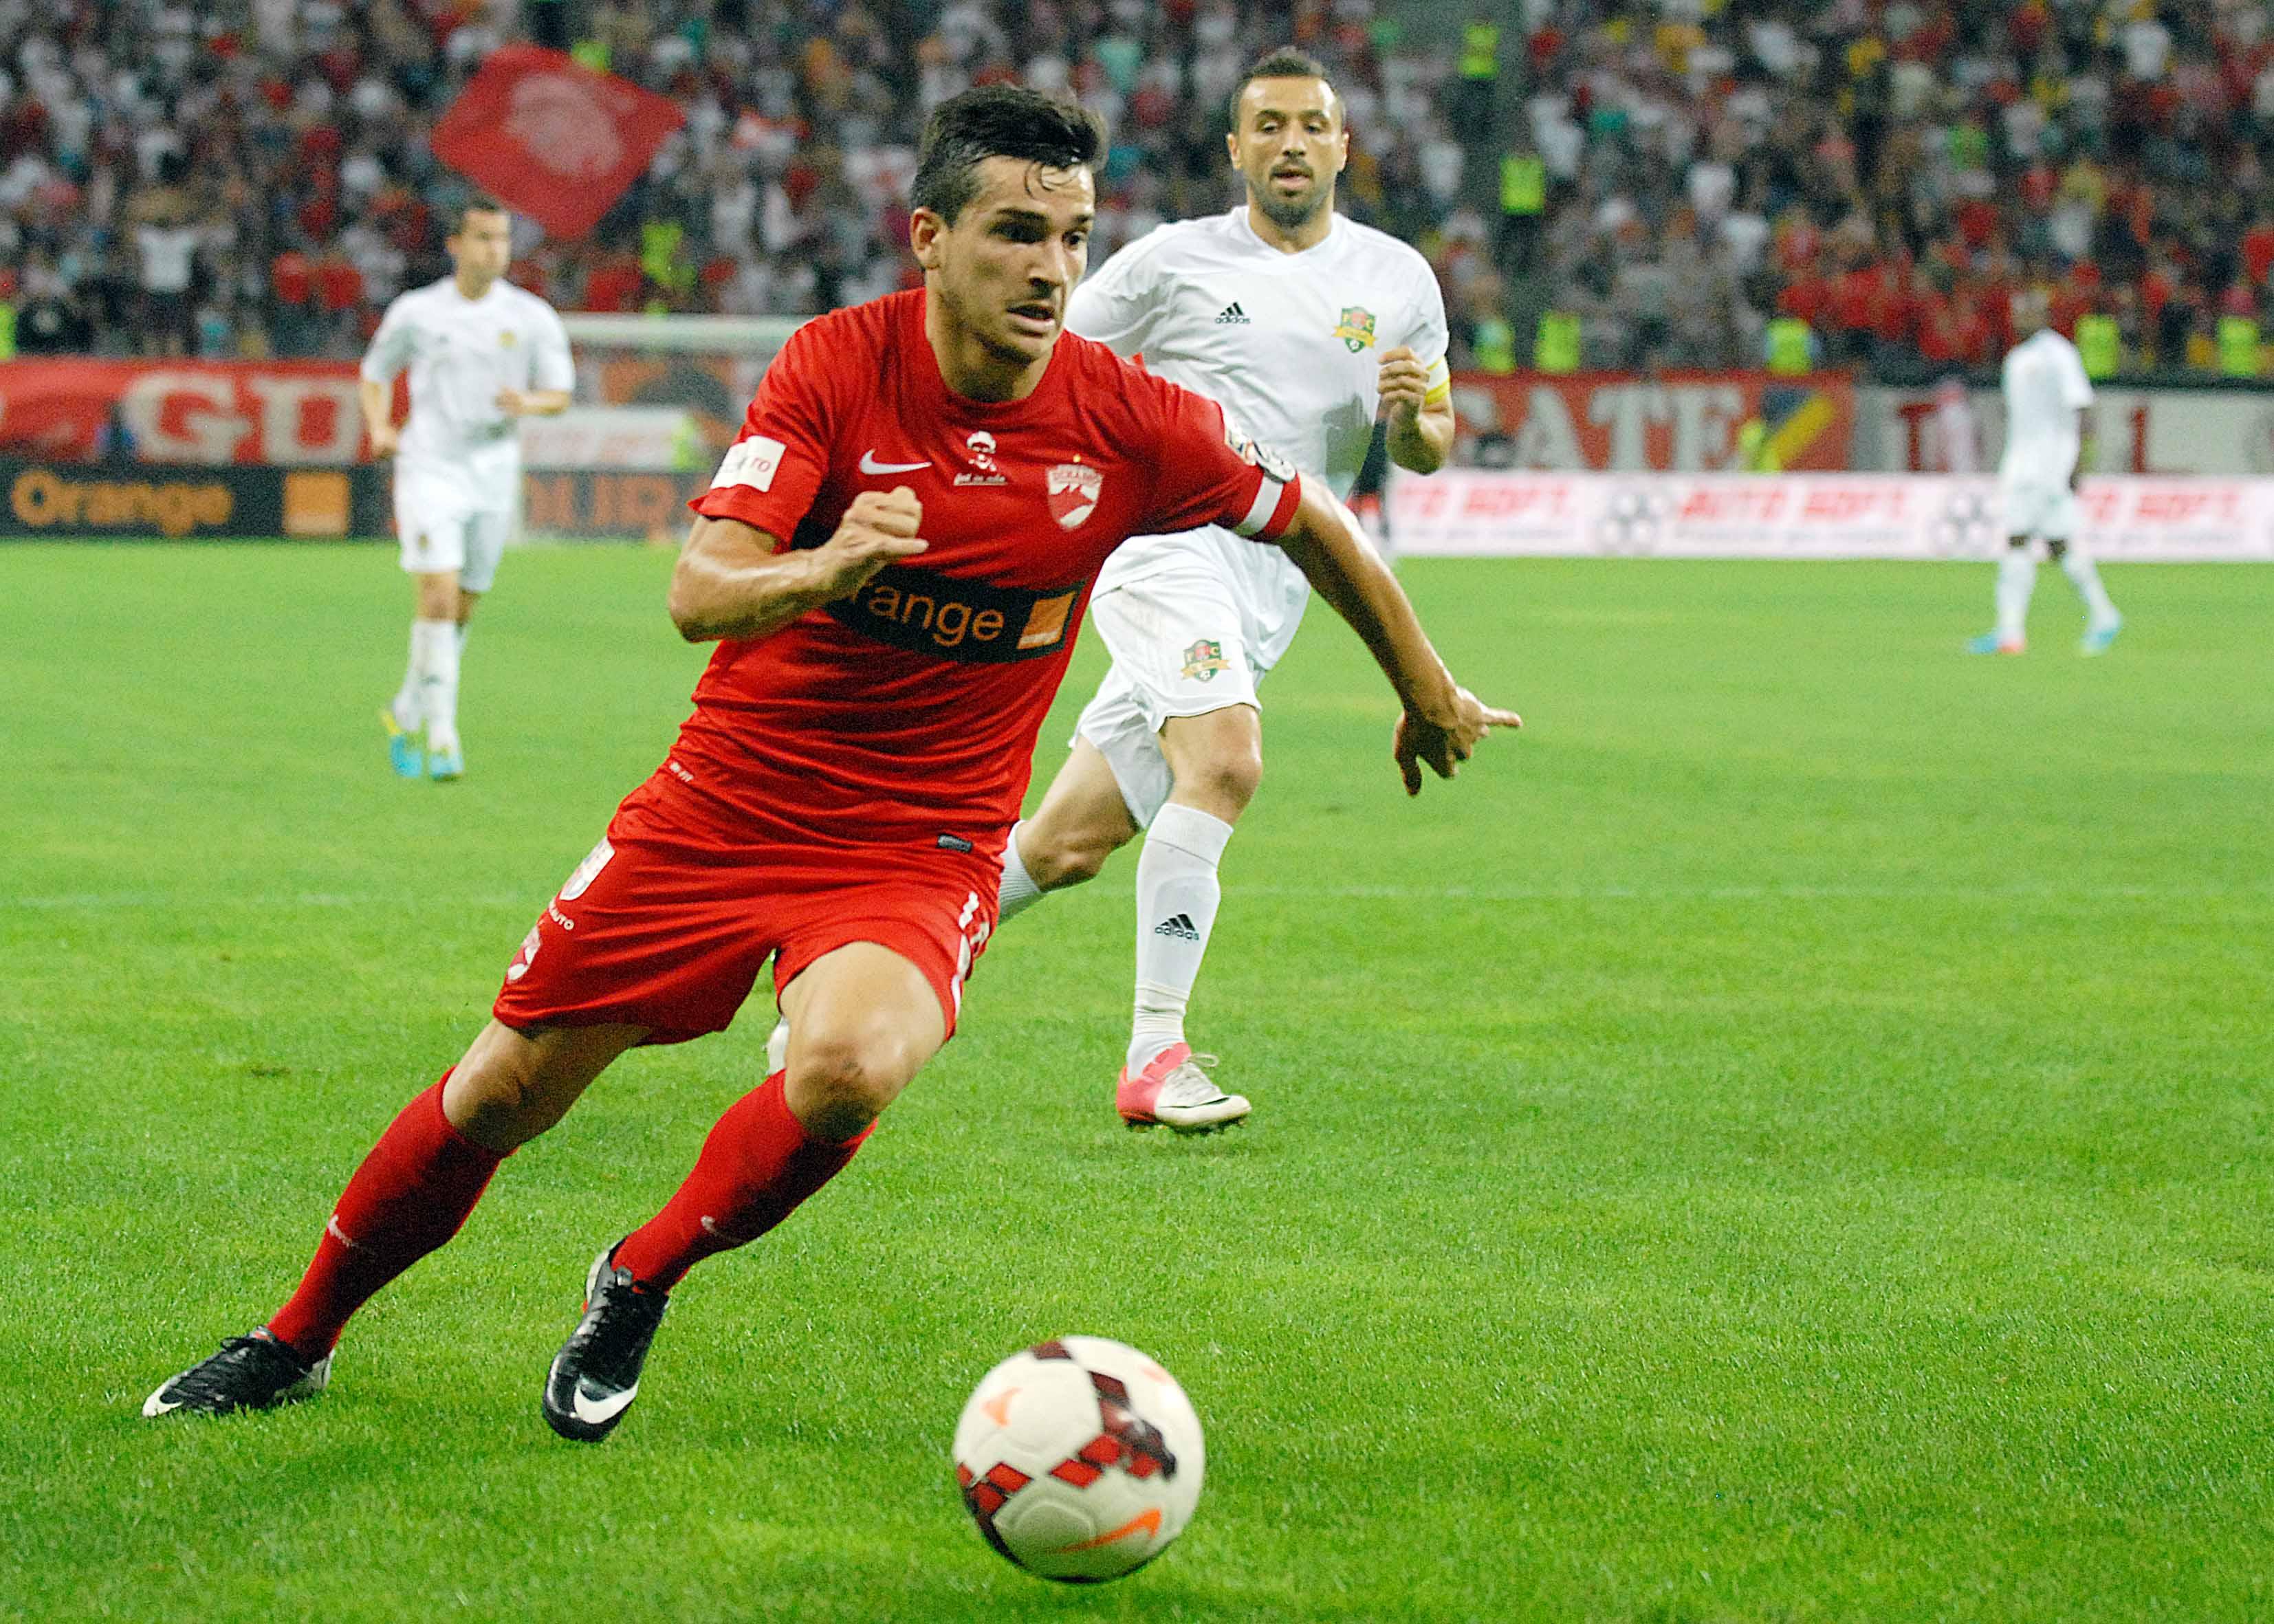 3.FOTBAL:DINAMO BUCURESTI-FC VASLUI 0-0,LIGA 1 (28.07.2013)